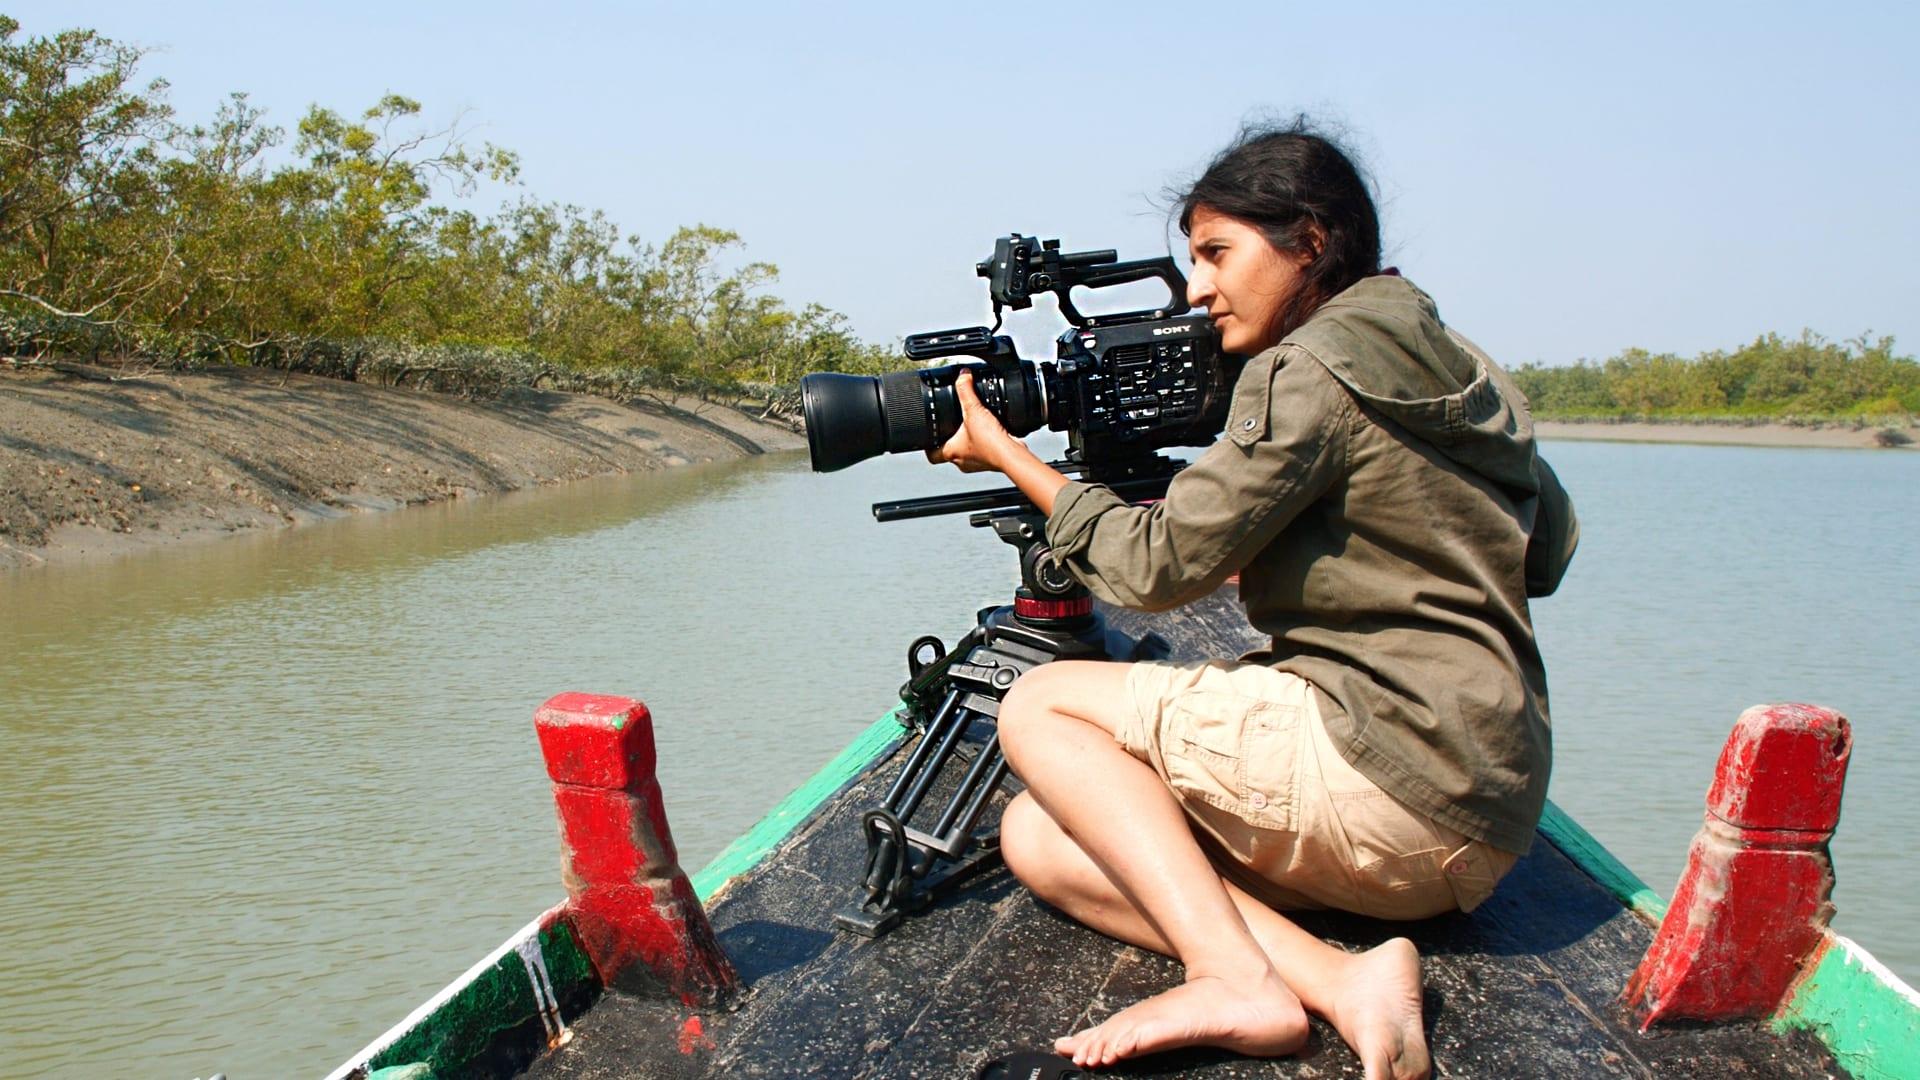 Filming Sundarbans: Behind the Lens with Ashwika Kapur